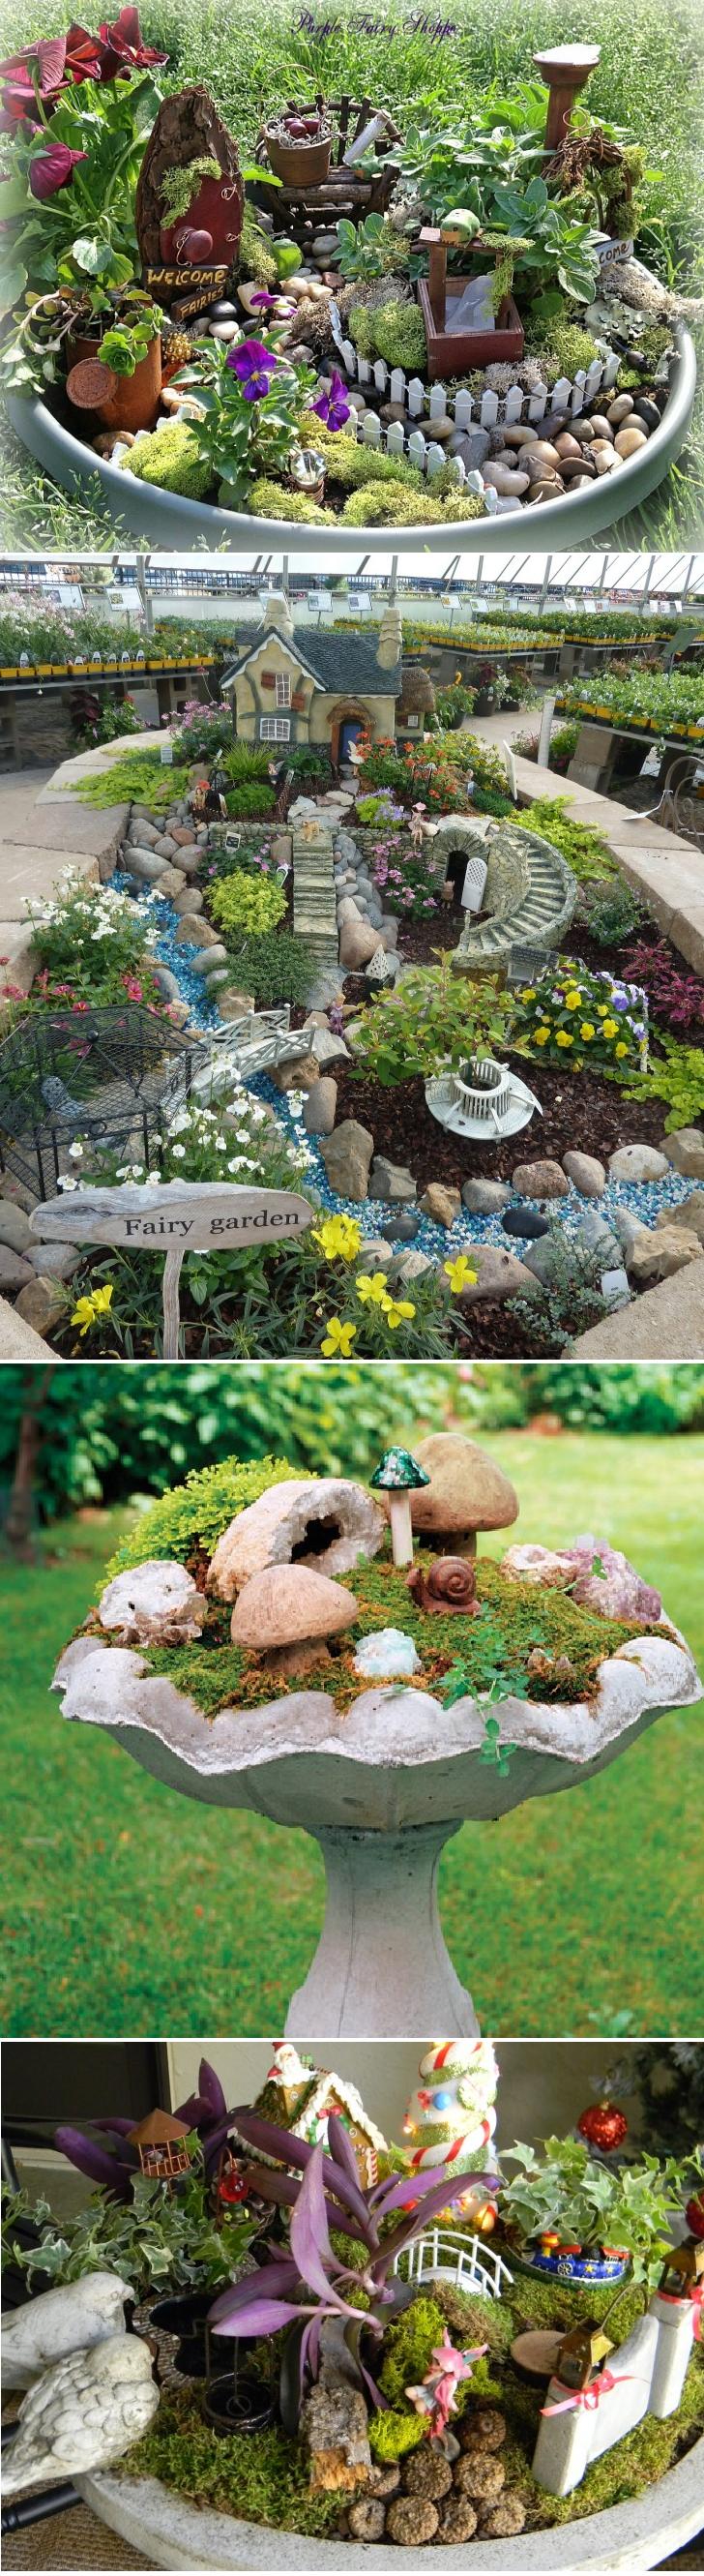 diy ideas how to make fairy garden gardening designing oh my gosh really want to do the bird bath mini garden